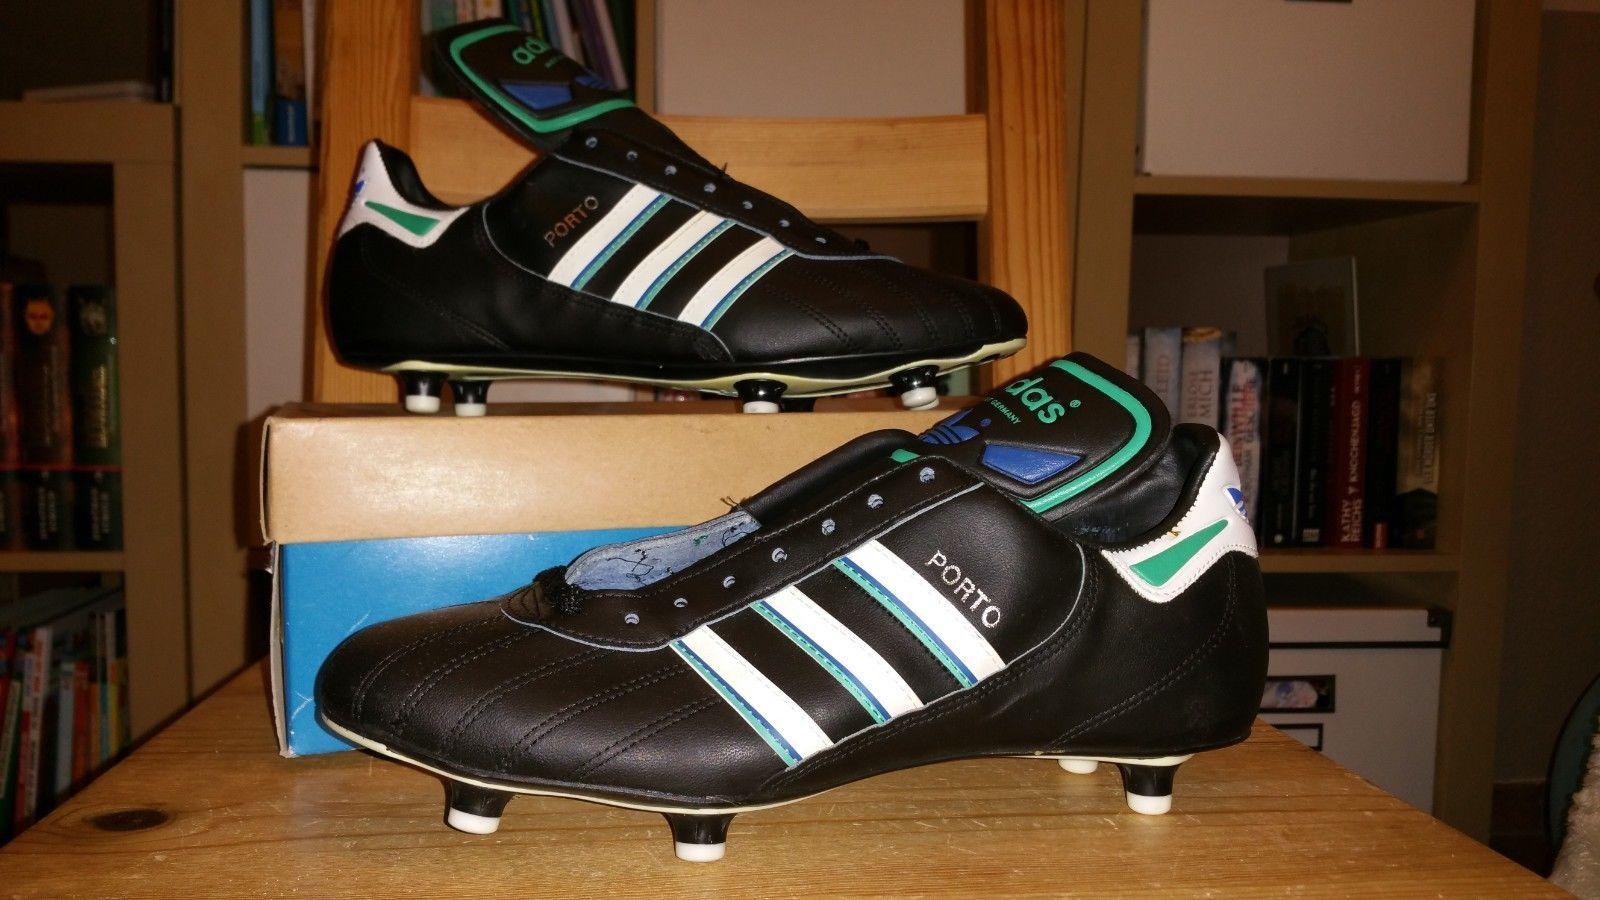 Adidas Porto Made in Germany Vintage 90s Fussball Schuhe Neu